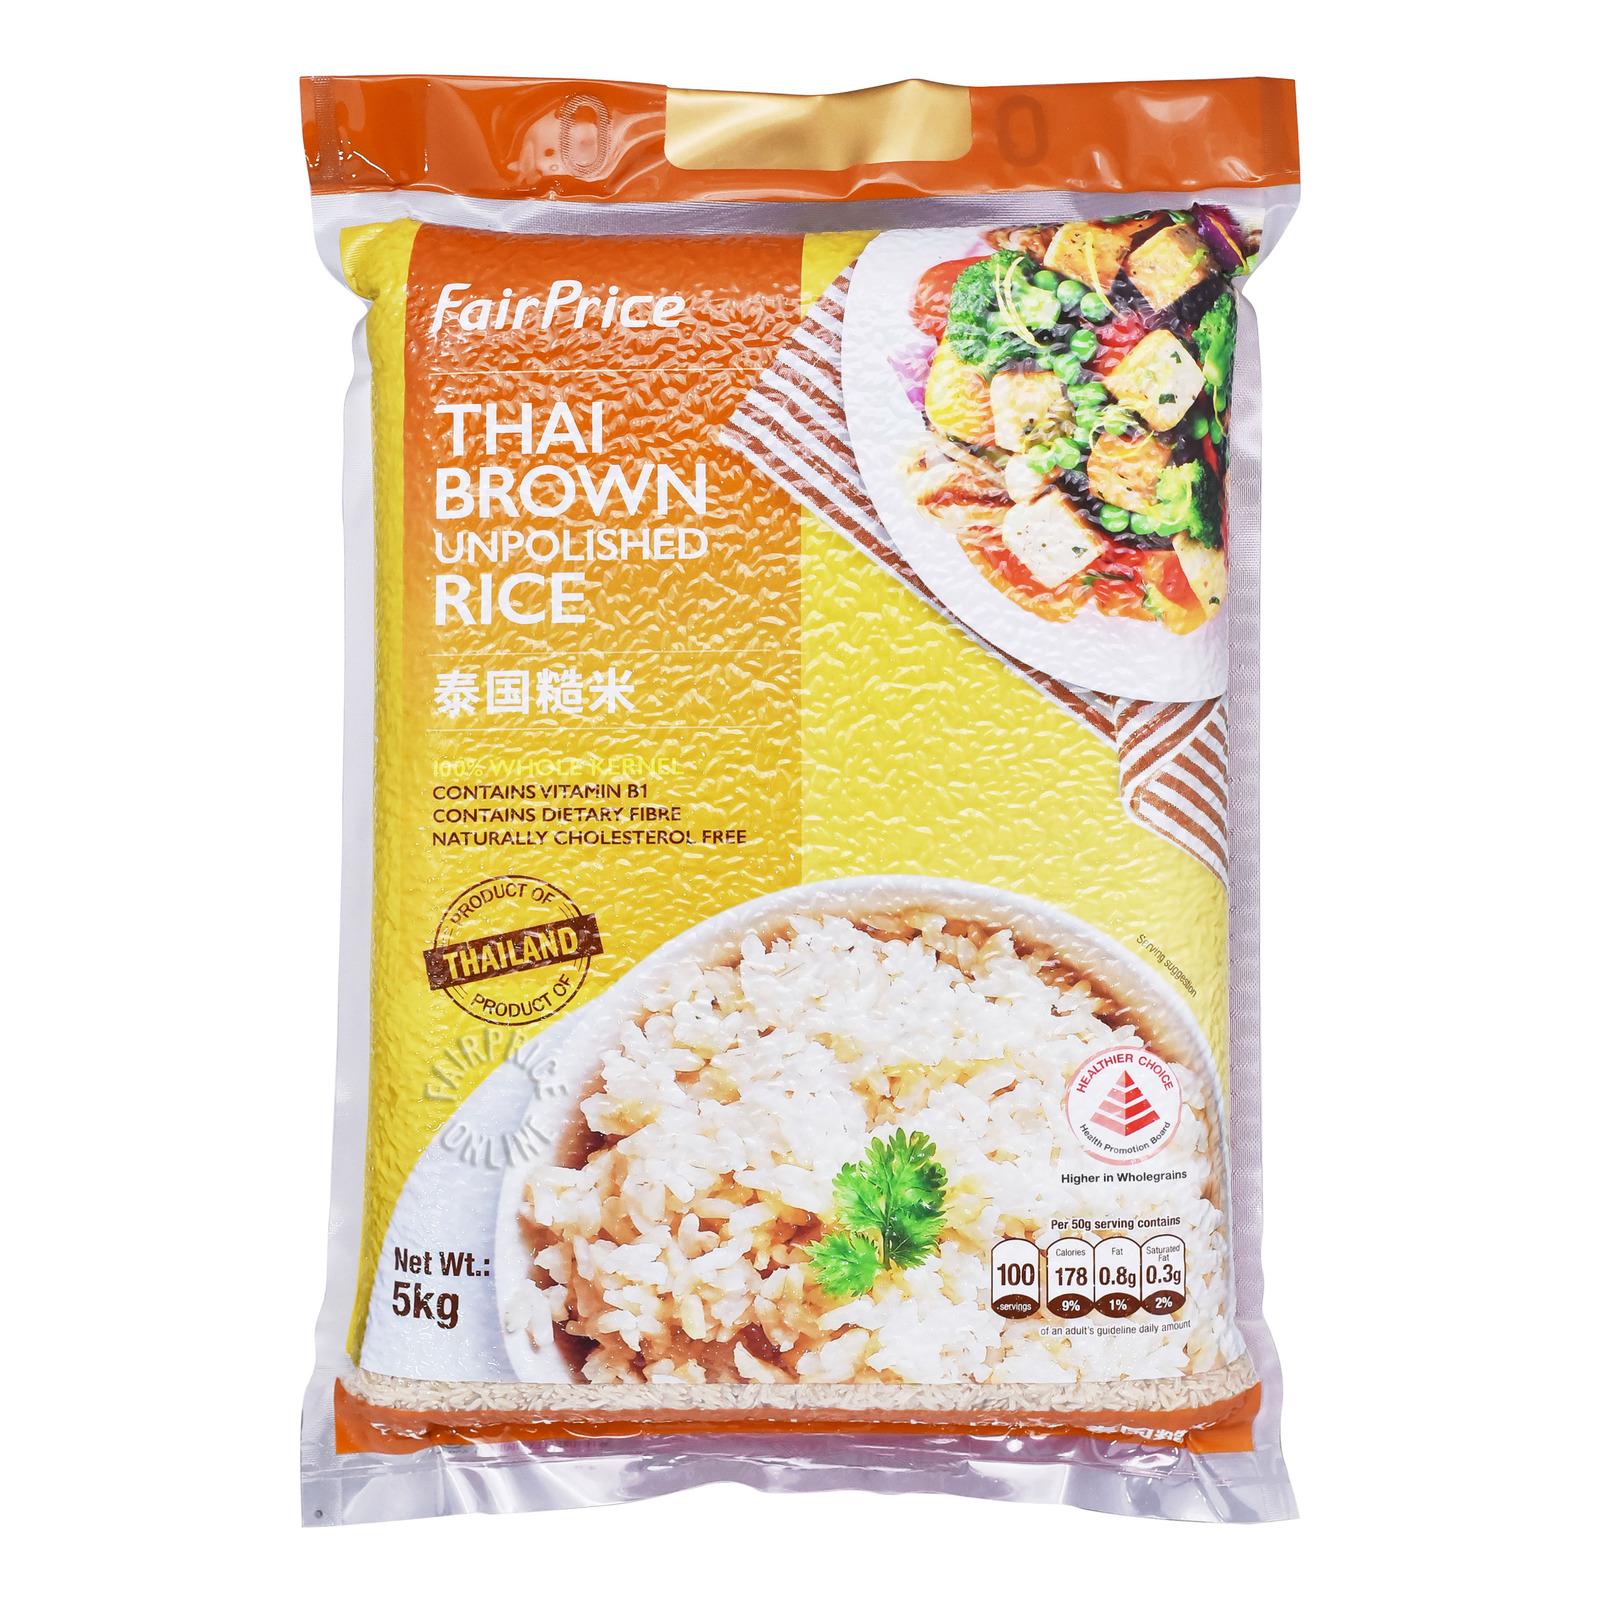 Fairprice Thailand Rice - Brown (Unpolished)